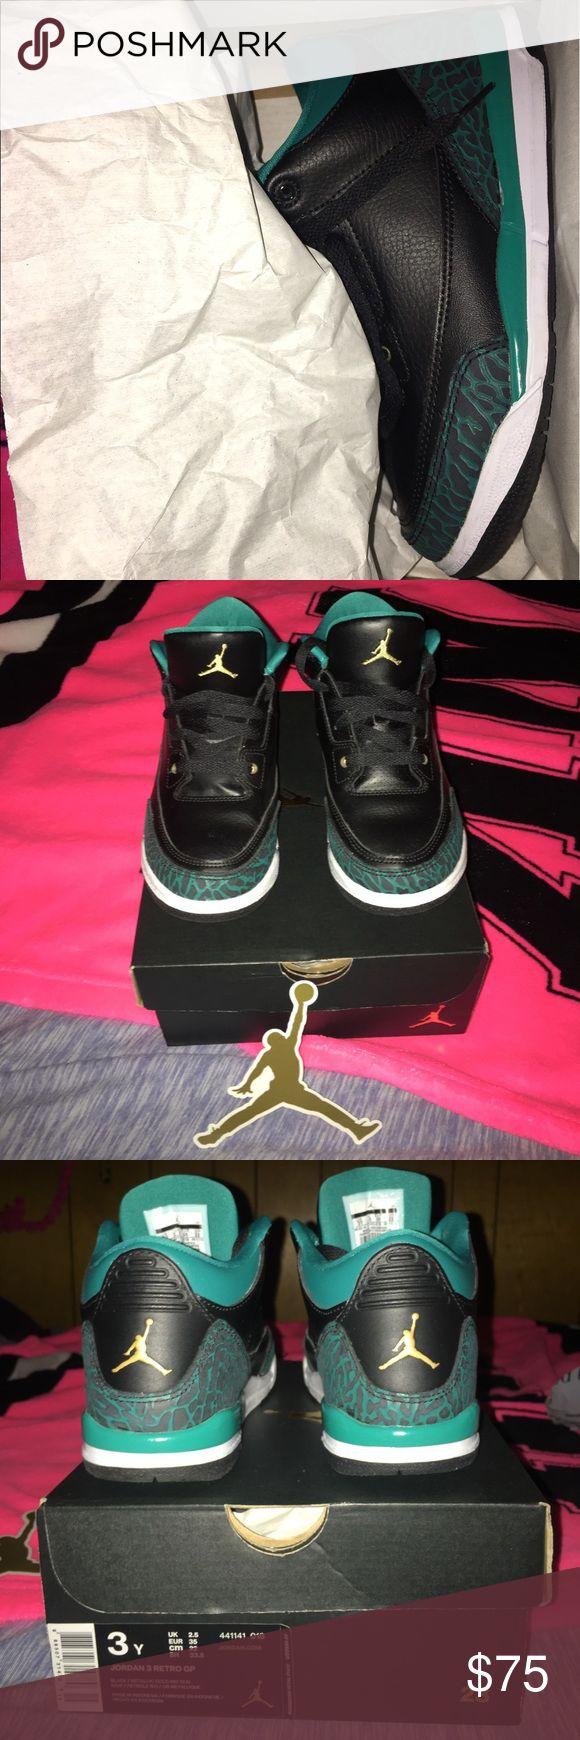 Nib~ Jordan Retro GP 3Y Nib~ Jordan Retro 3 GP 3Youth. Hot Sneaks with Black/Metallic Gold~Rio Teal! Jordan Shoes Sneakers